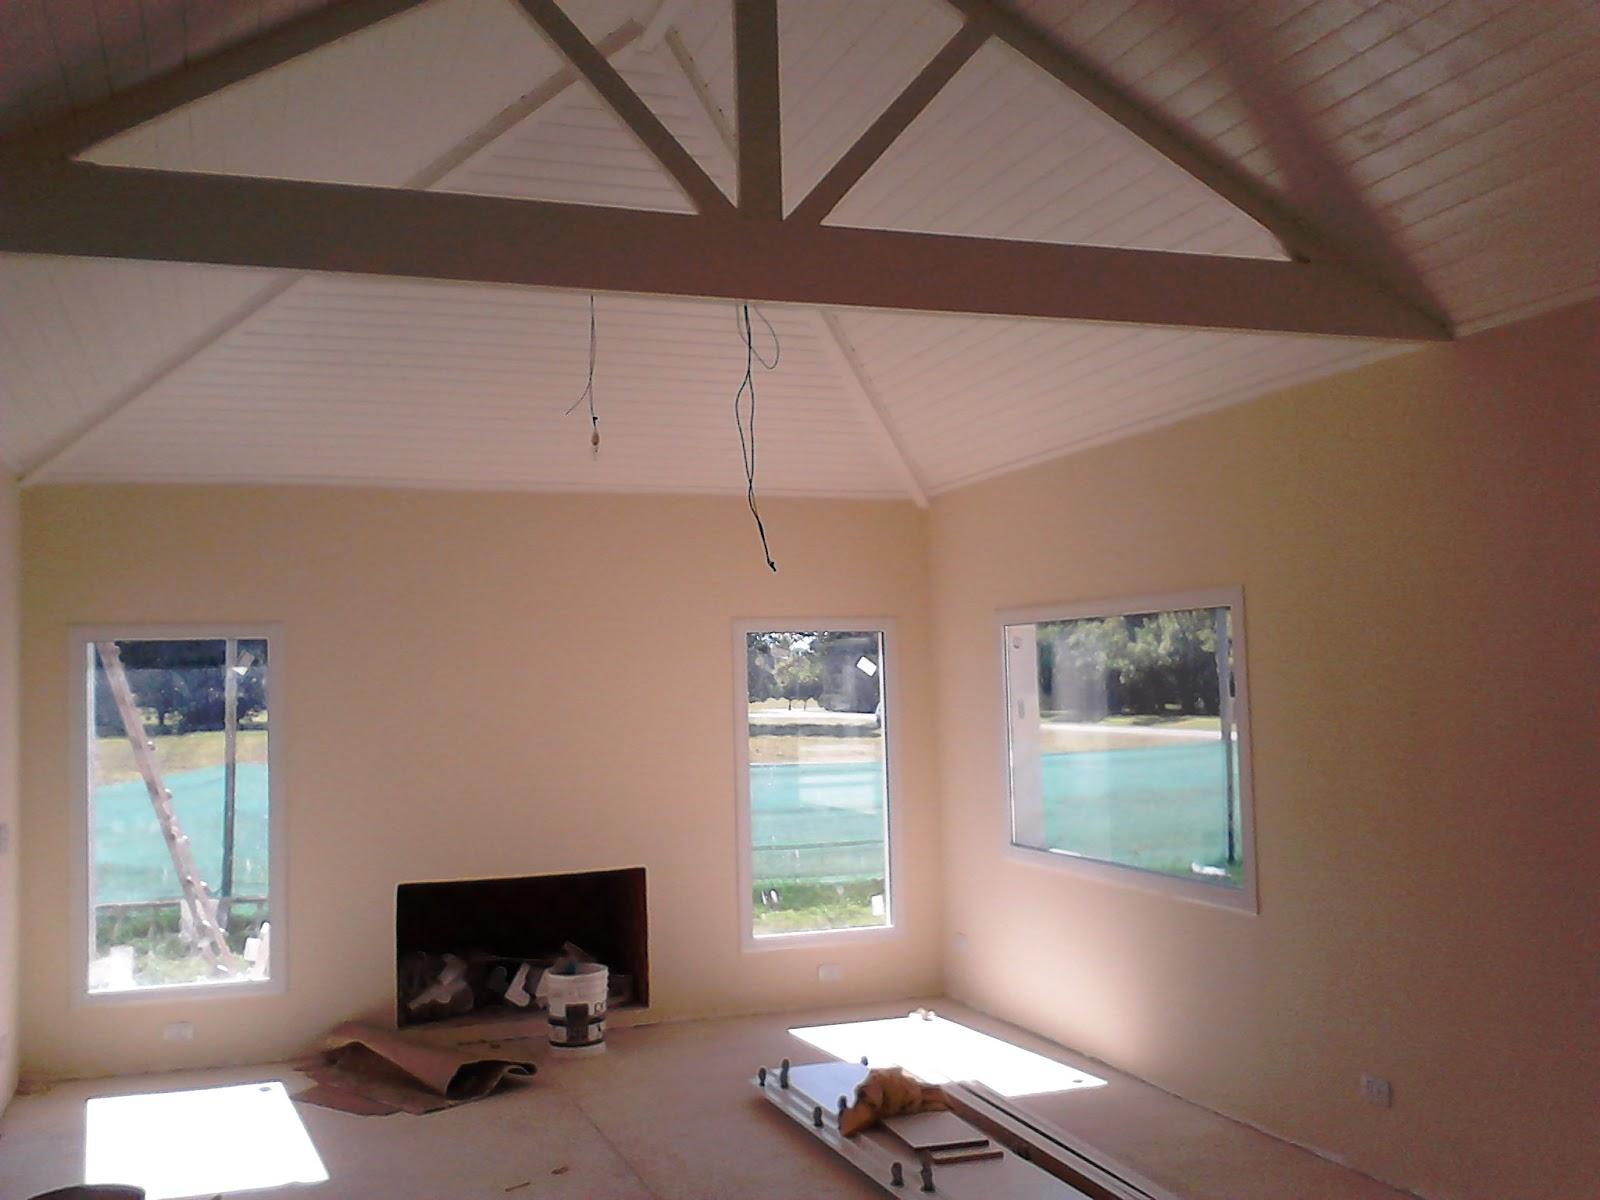 Arq martin arevalo arquitectura construcciones for Cielos falsos para dormitorios